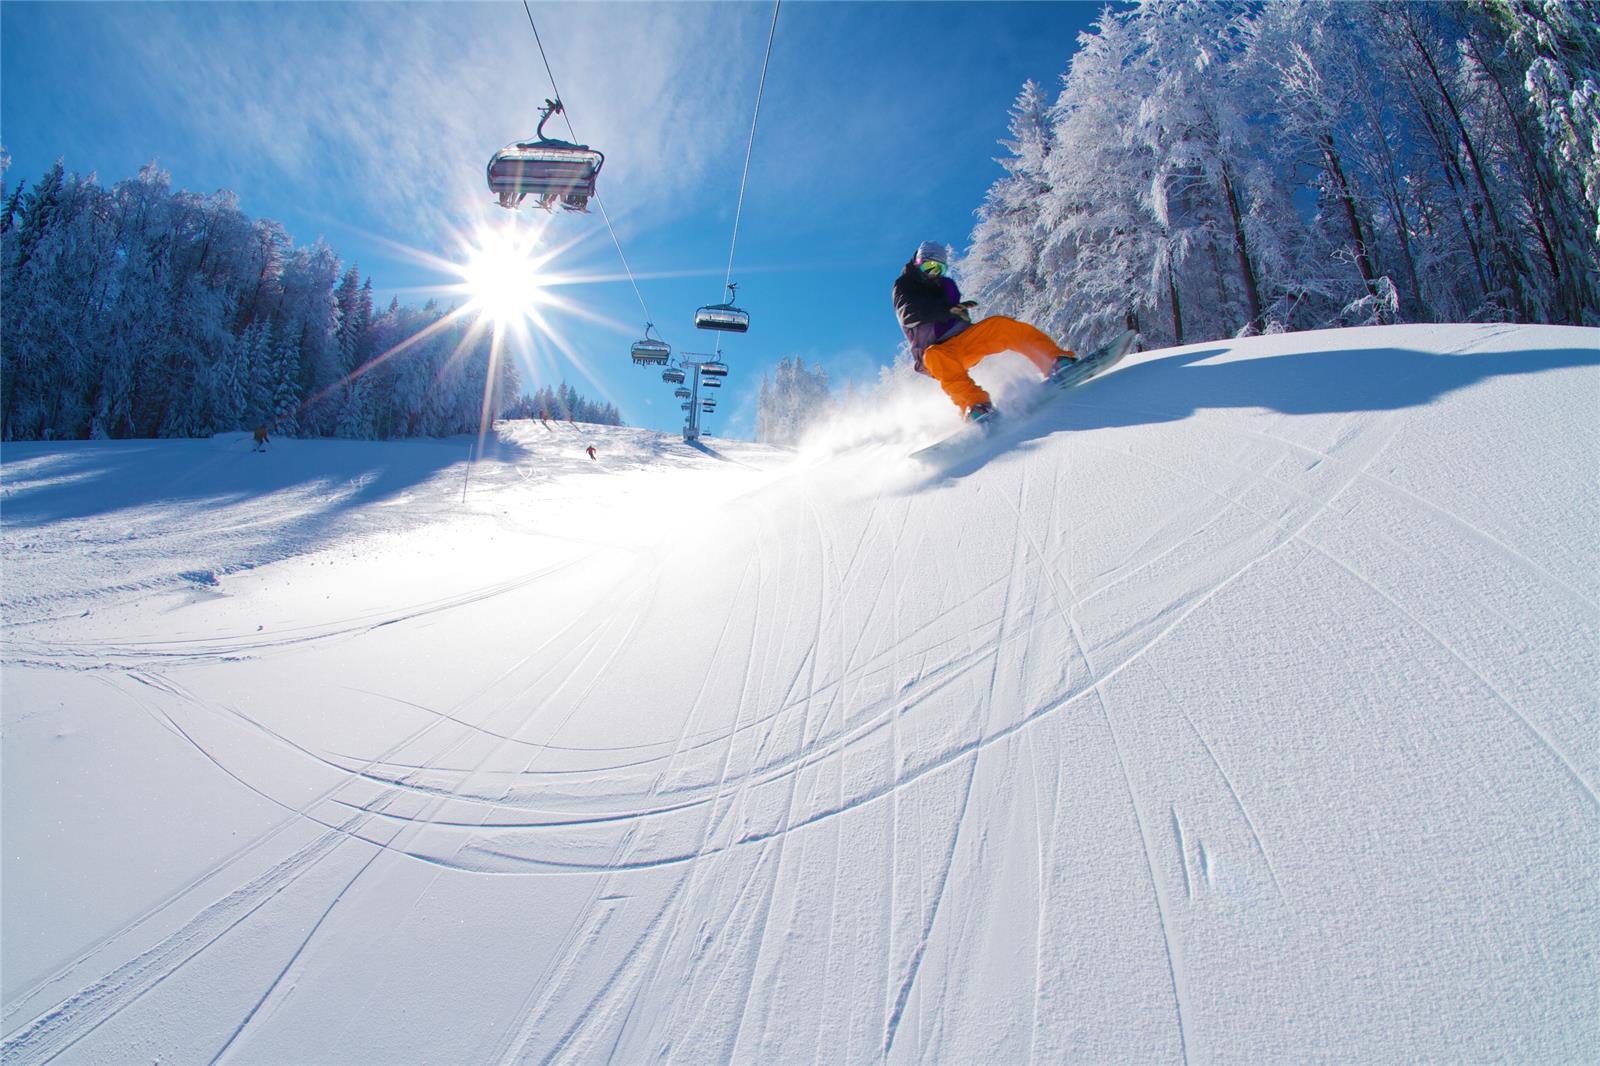 Maribor-Pohorje ski resort